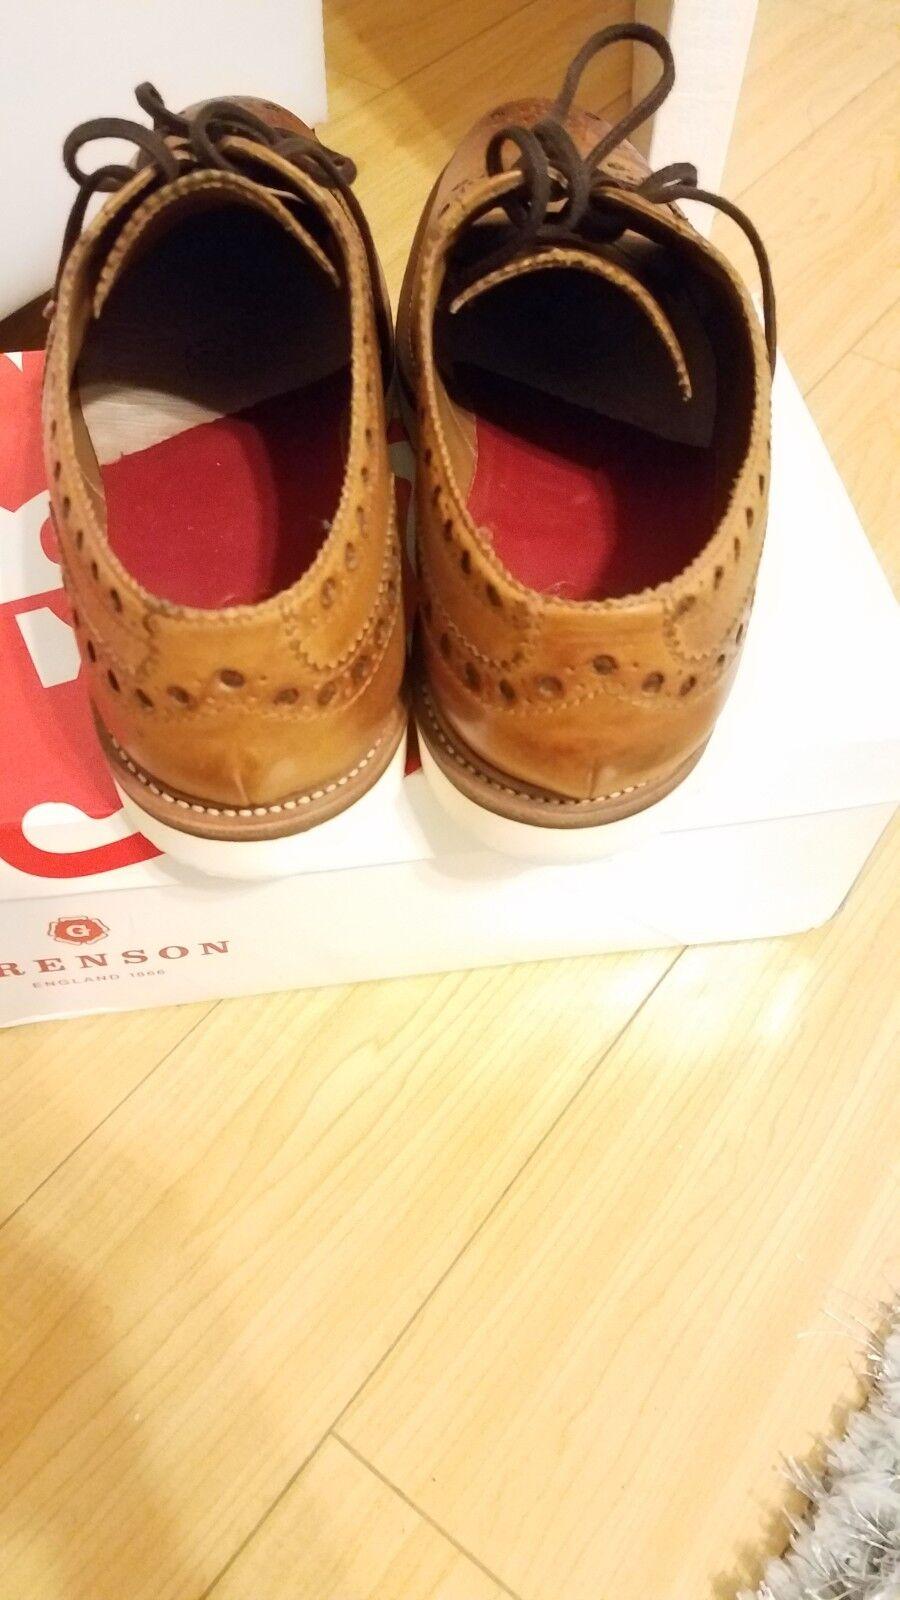 5e5eb8ba90bf ... Men Grenson Oxford shoes size 12 12 12 leather fe636b ...